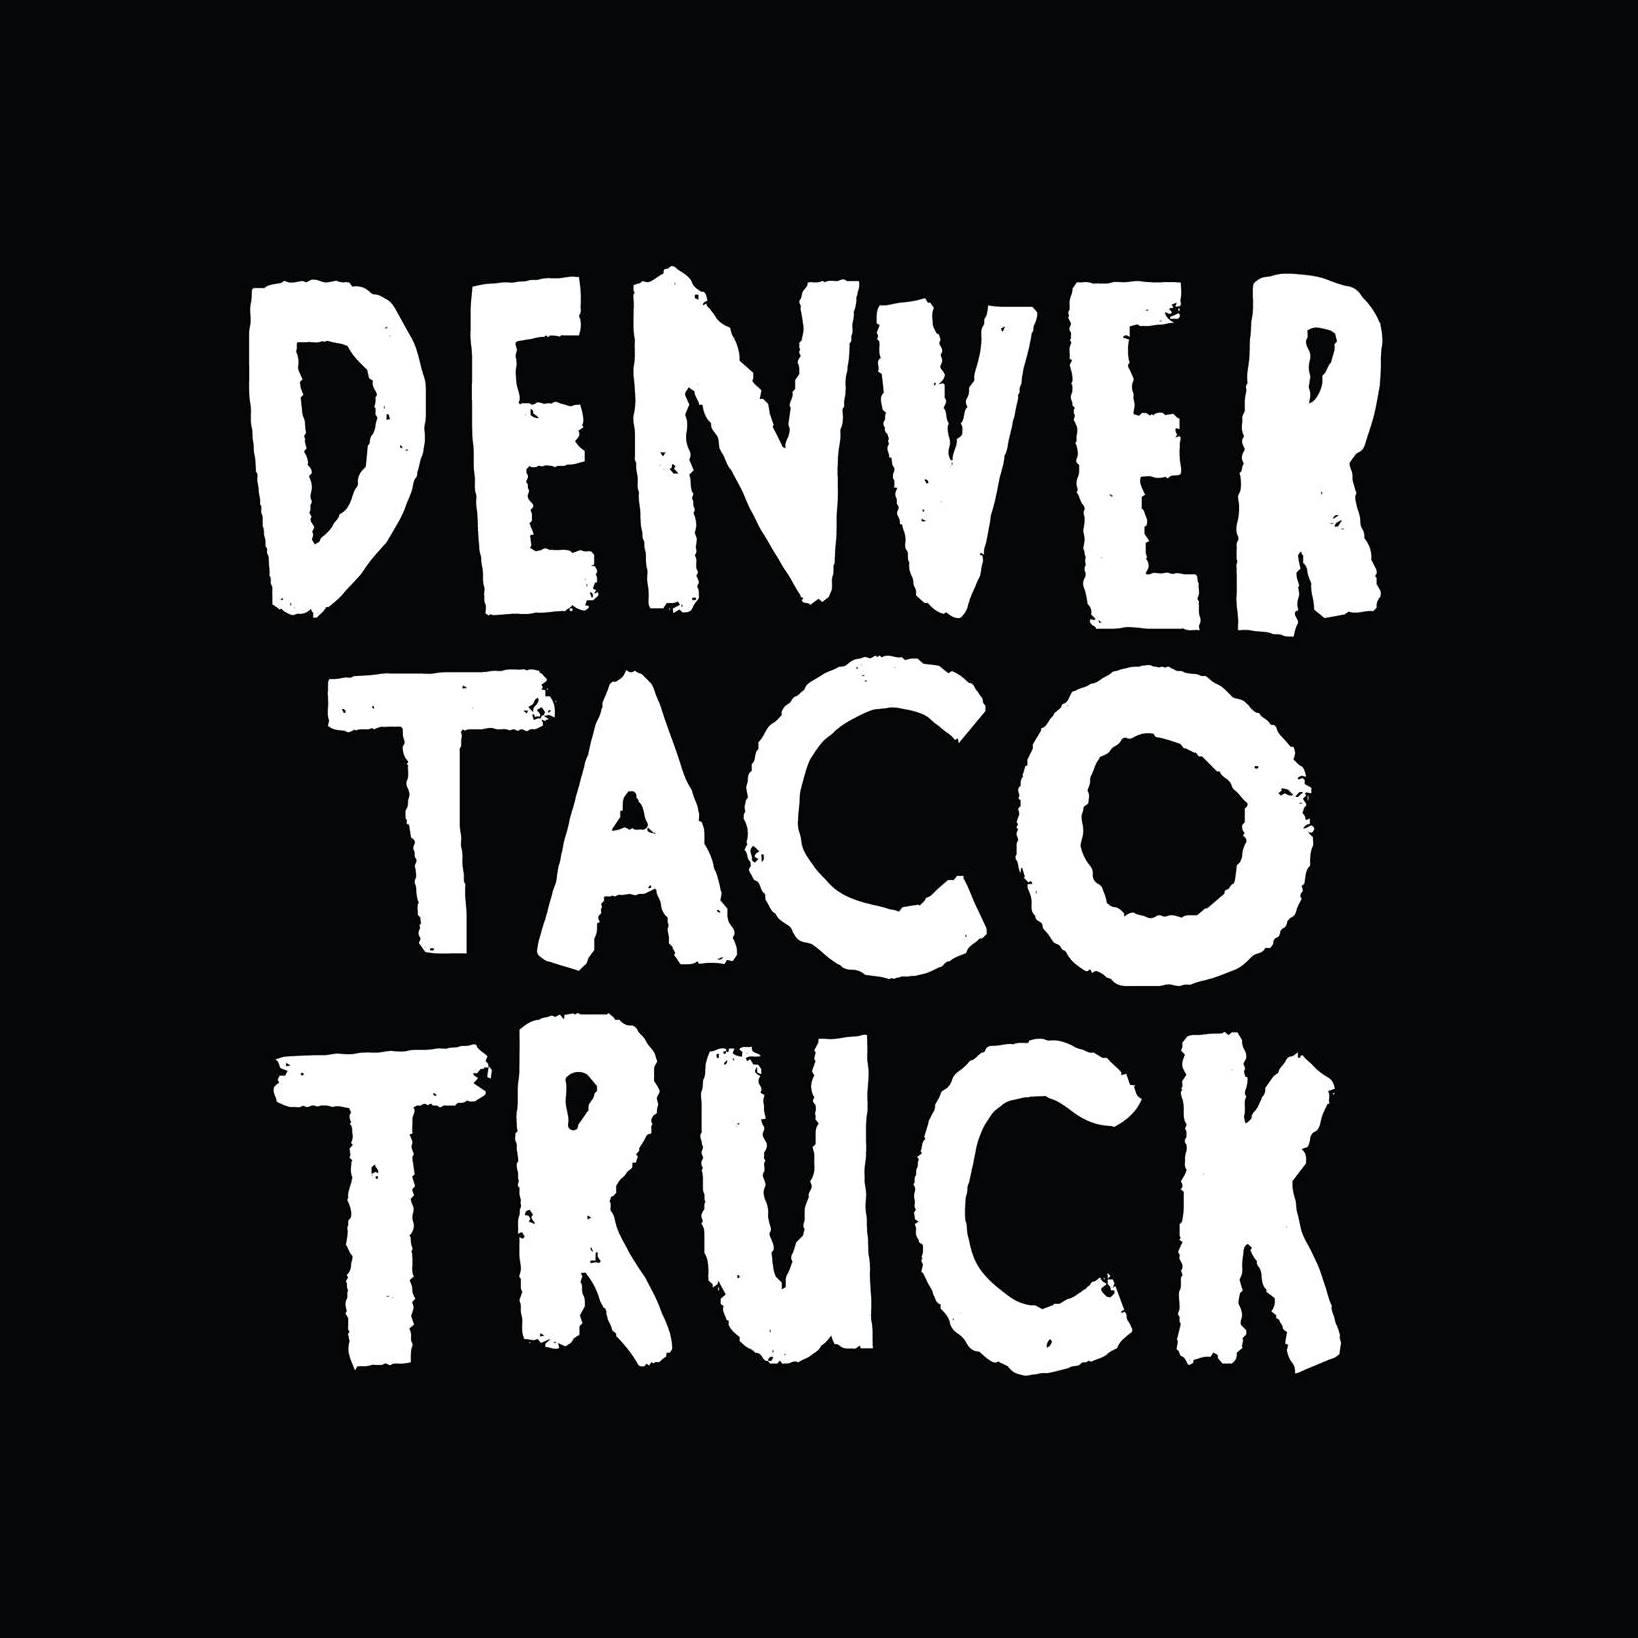 Denver Taco Truck logo